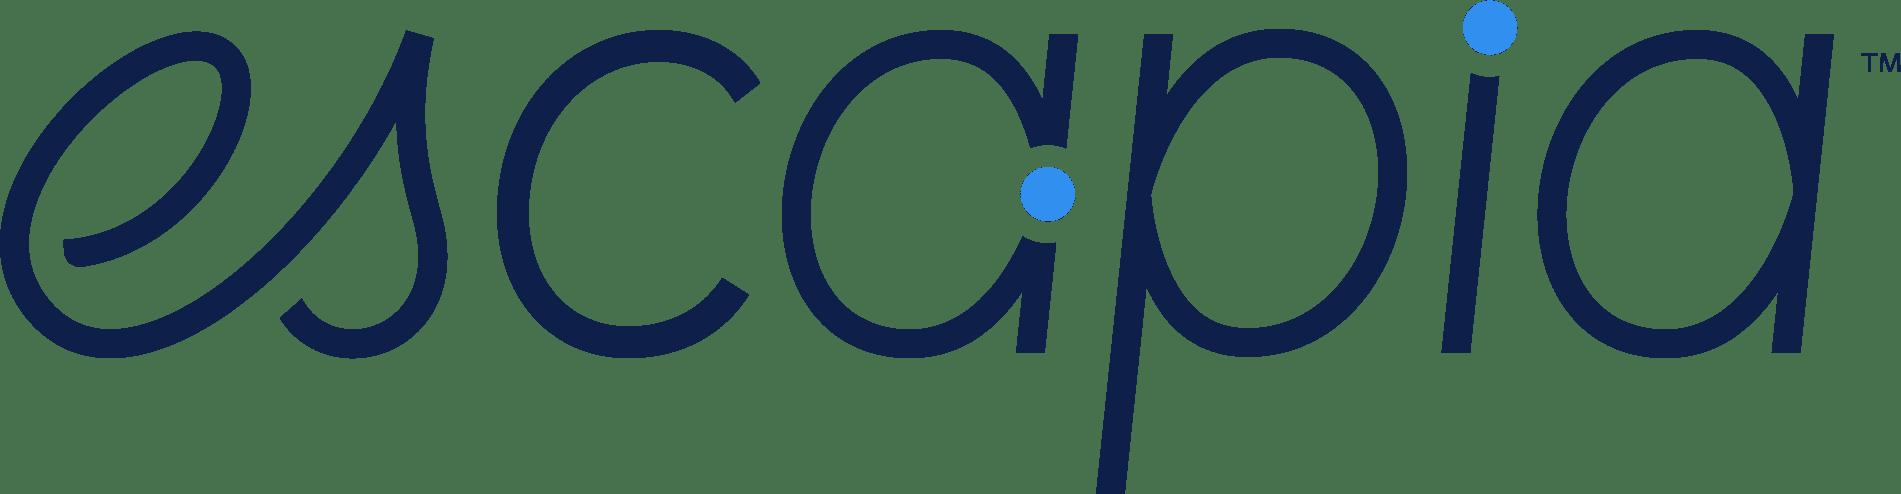 Escapia_Logo_Full_Color_on_Light